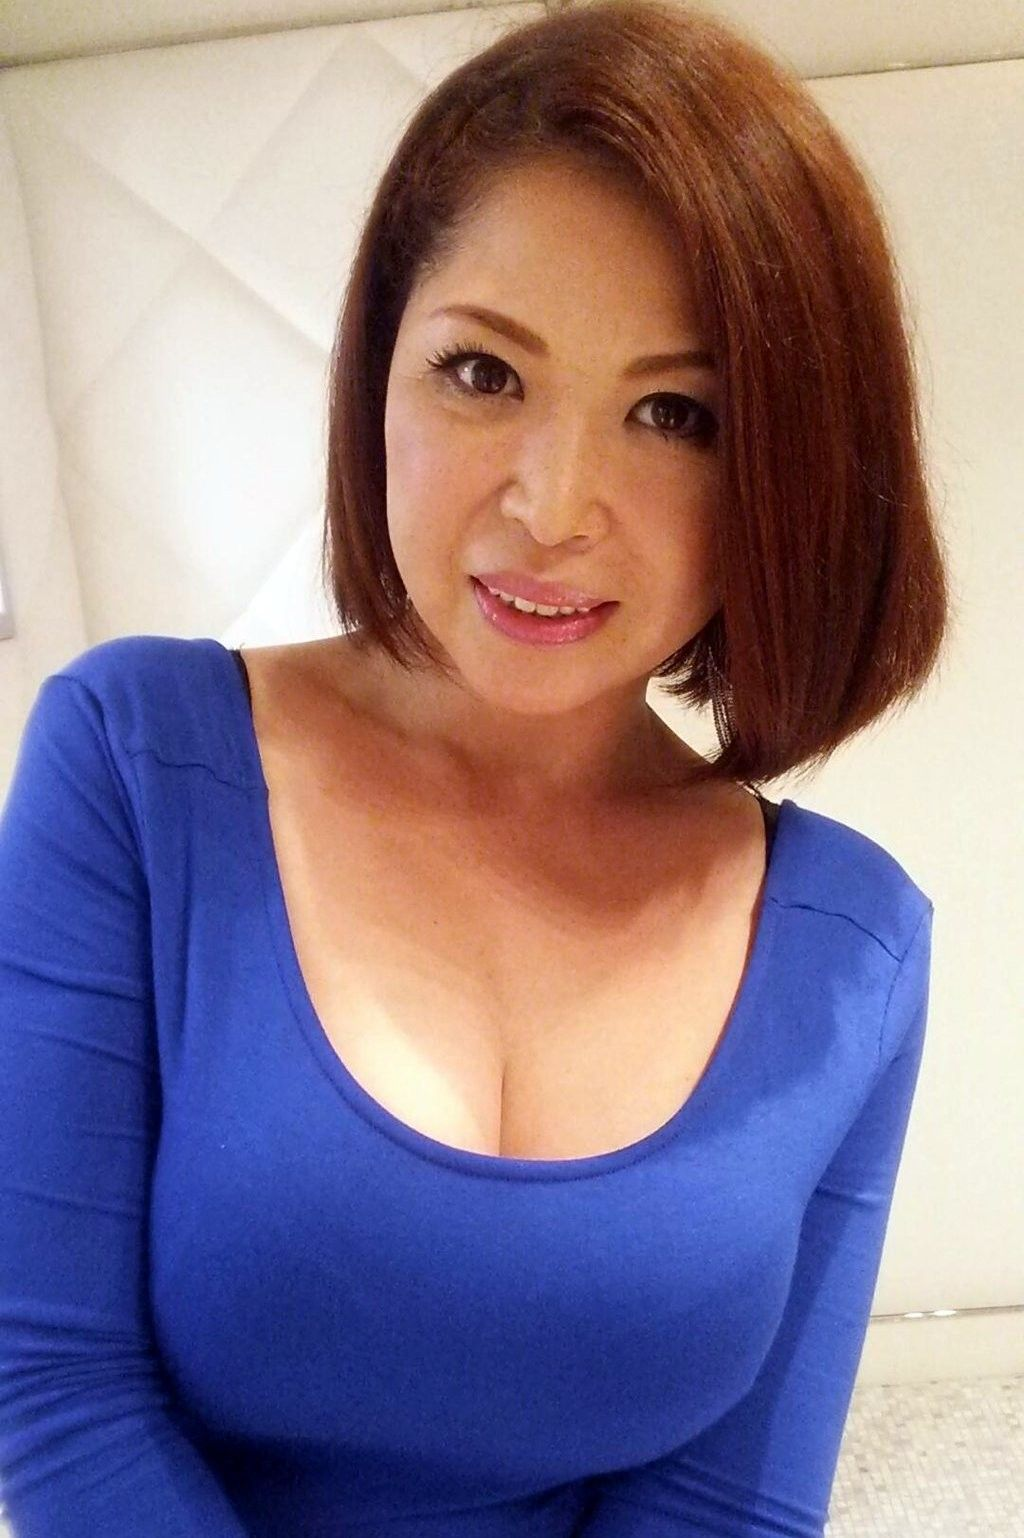 Natsuko Kayama 『 加山 なつこ 』 2 No 064 庭 Pinterest